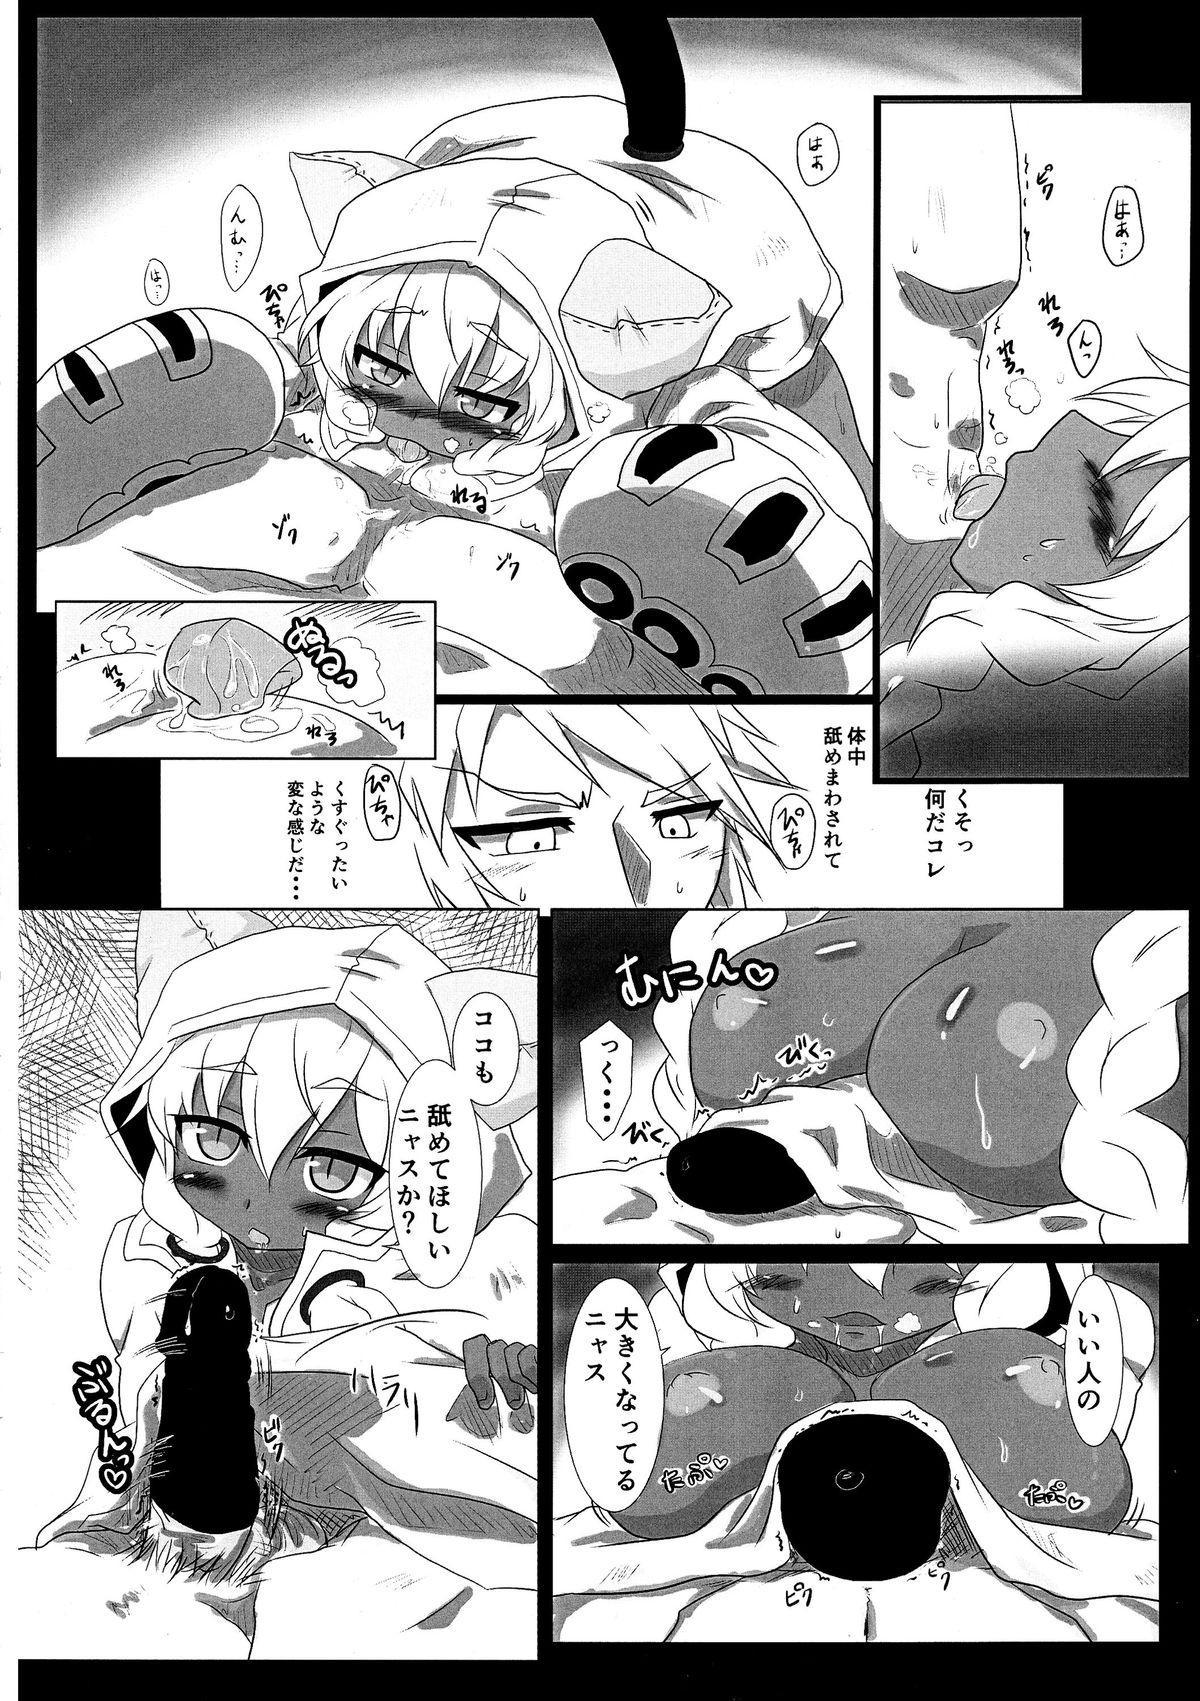 Tao no Ongaeshi 17